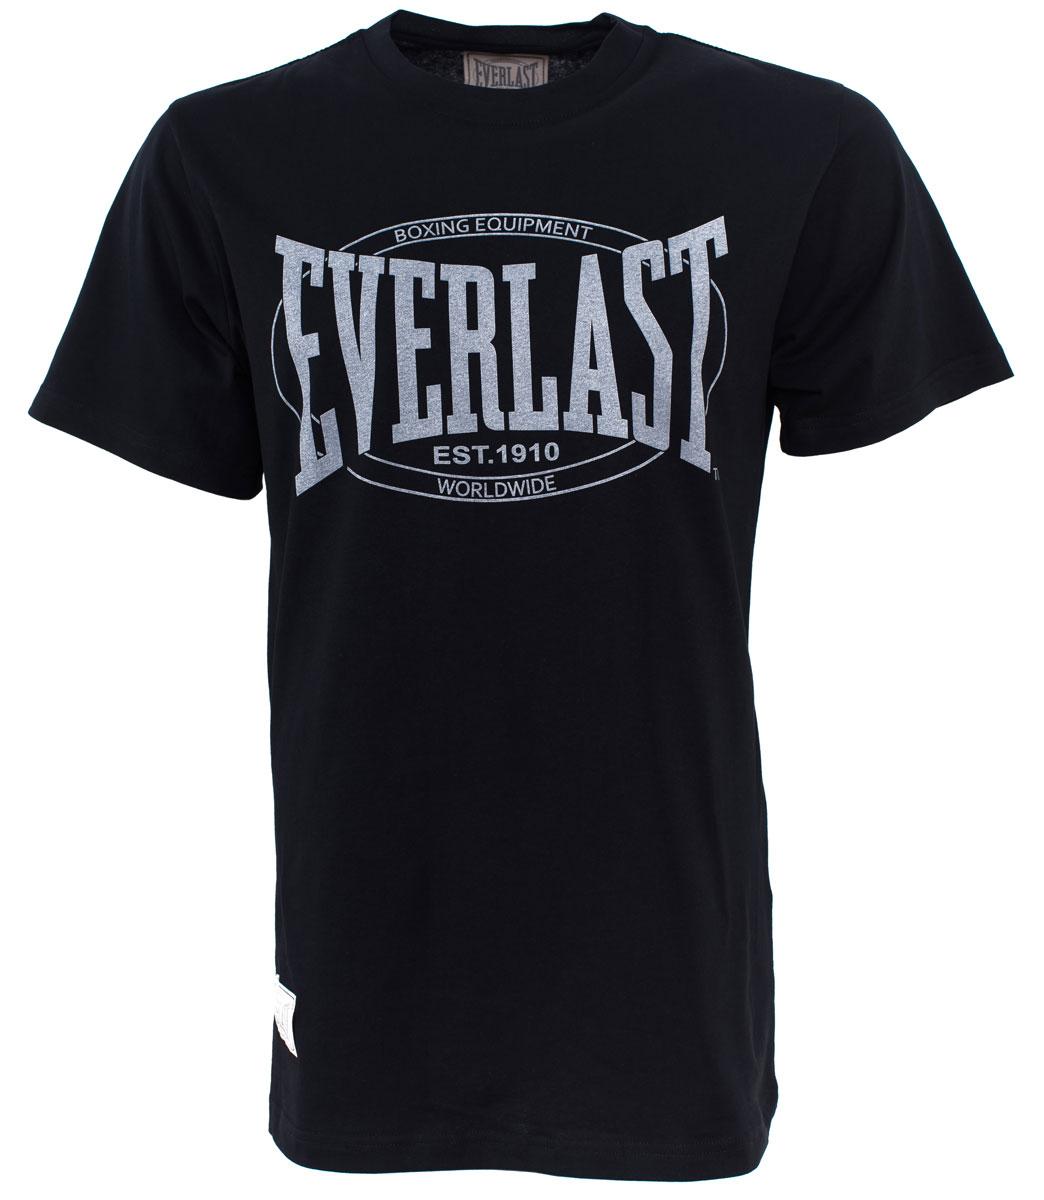 Футболка мужская Everlast Old Authentic, цвет: черный. RE0013. Размер XXL (54/56) футболка мужская mitre цвет желтый tt29019 размер xxl 54 56